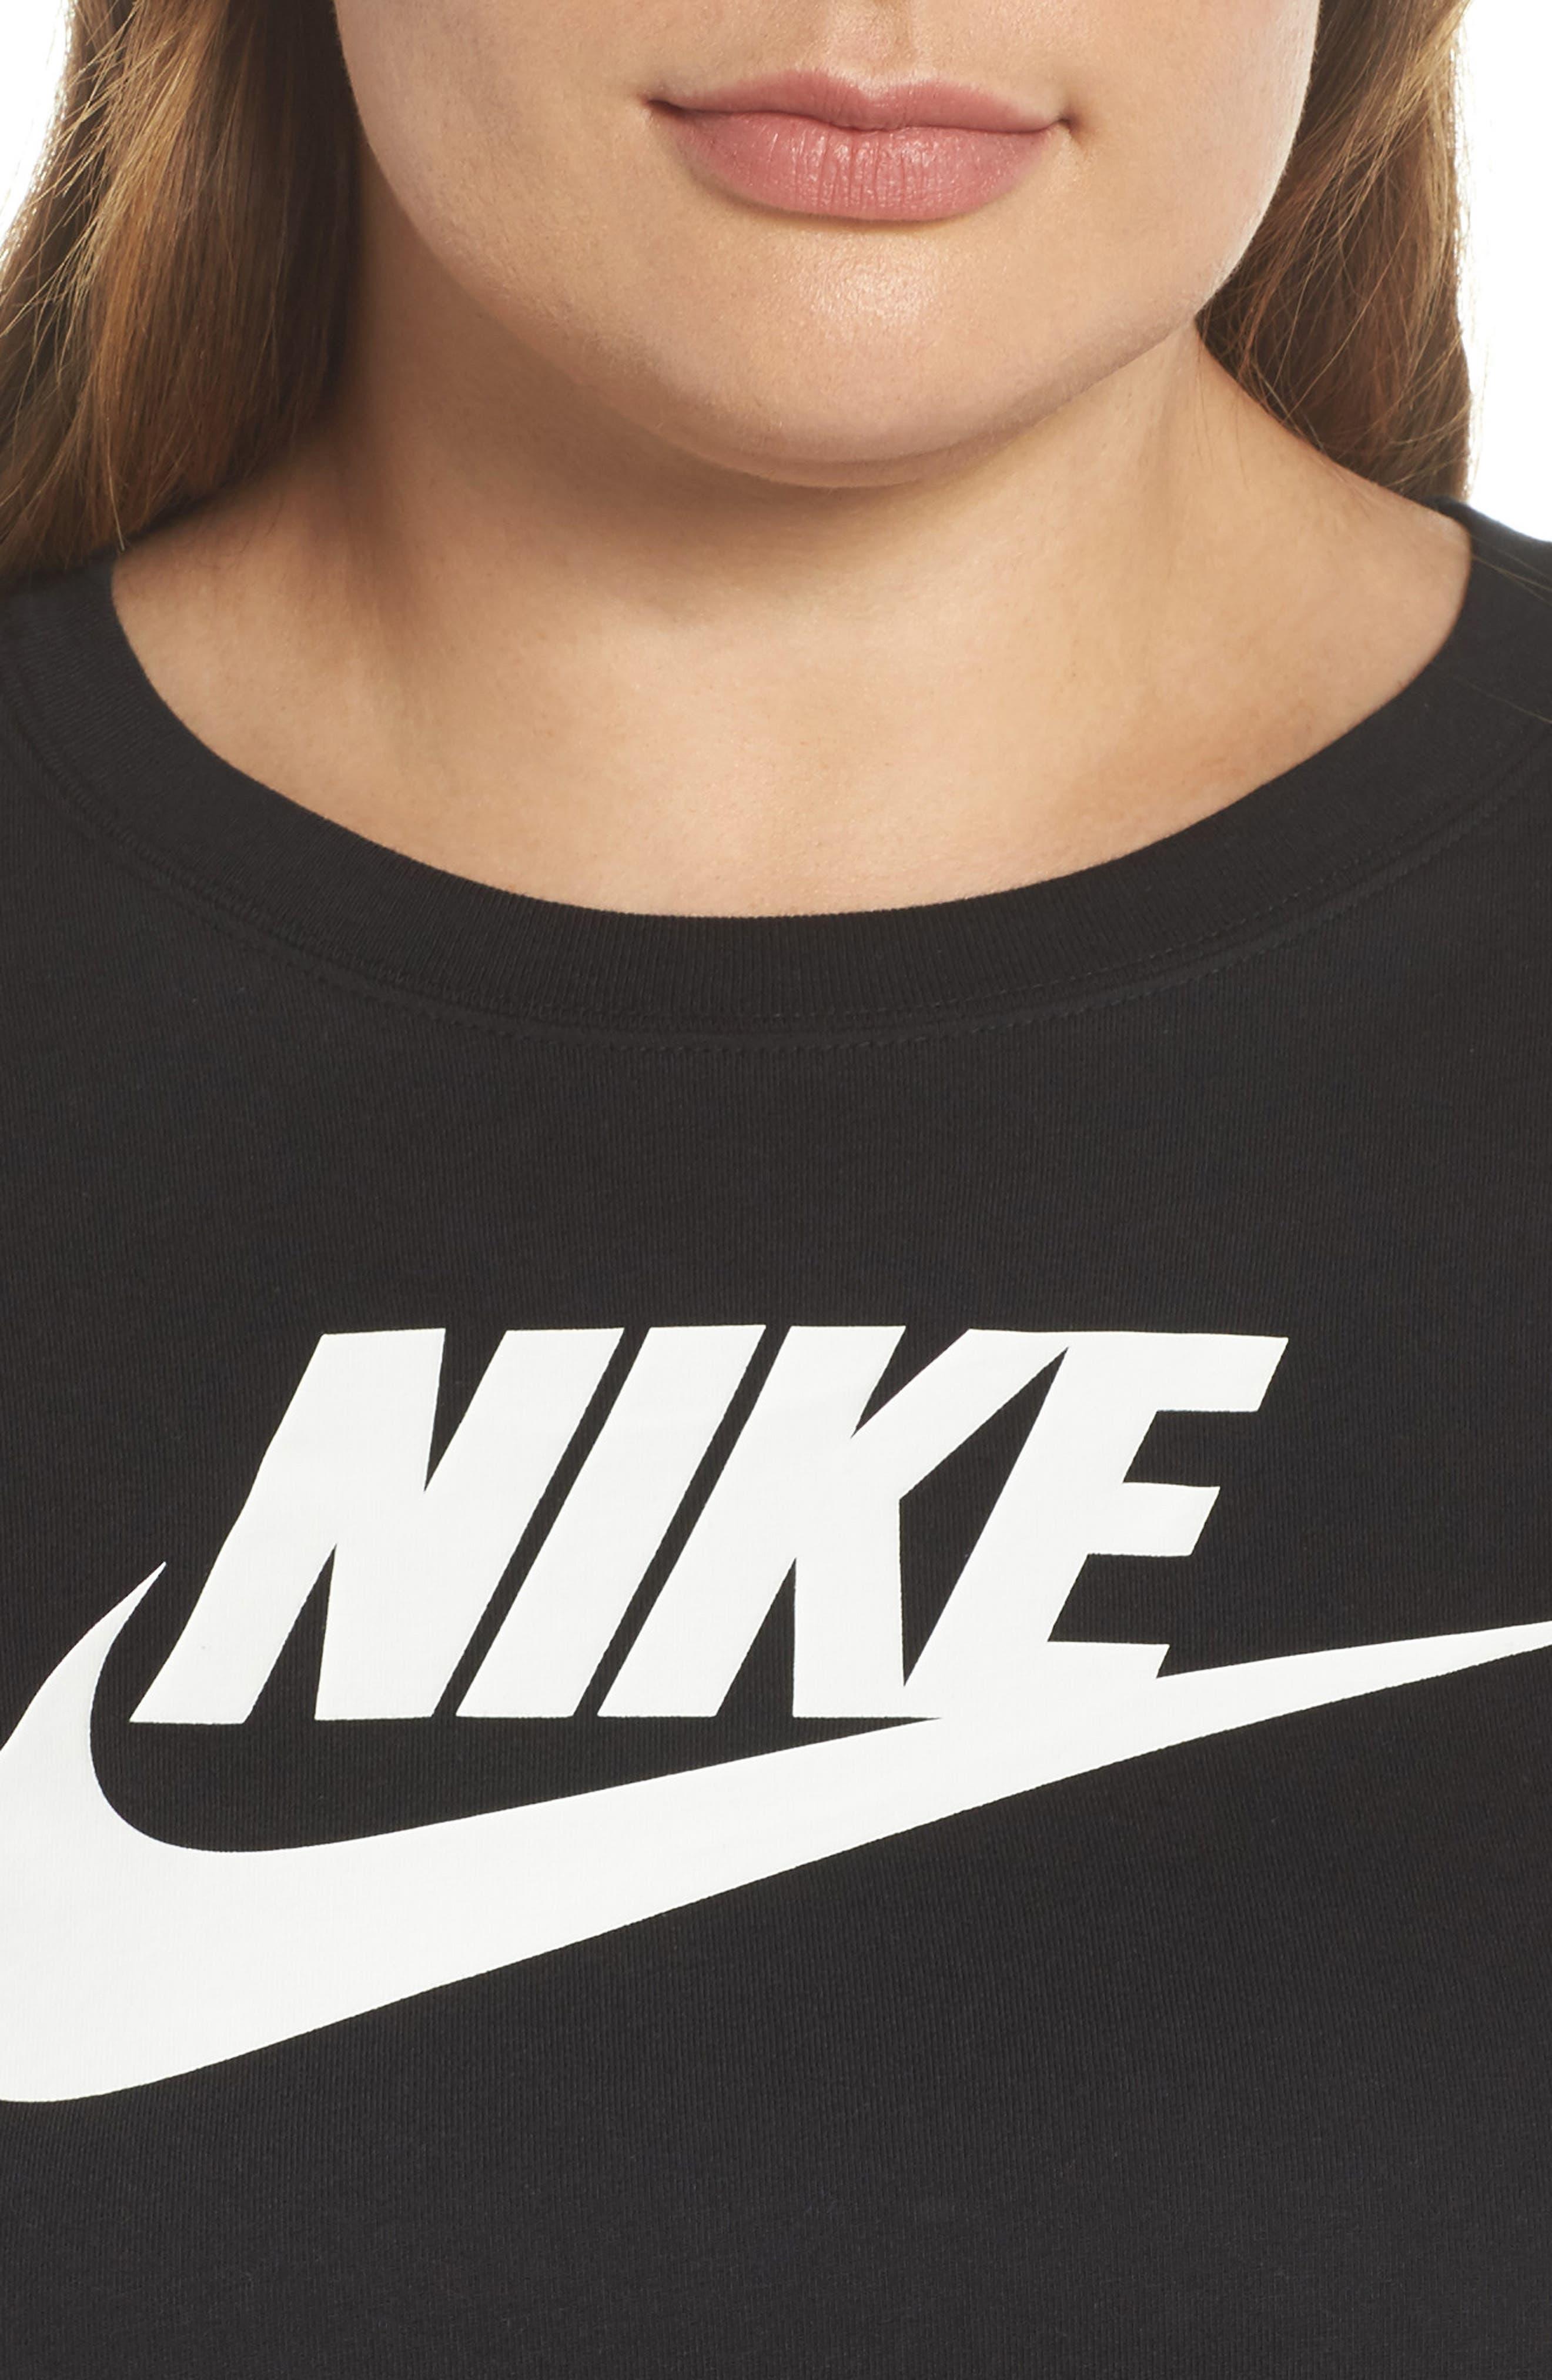 Sportswear Long Sleeve Tee,                             Alternate thumbnail 4, color,                             Black/ White